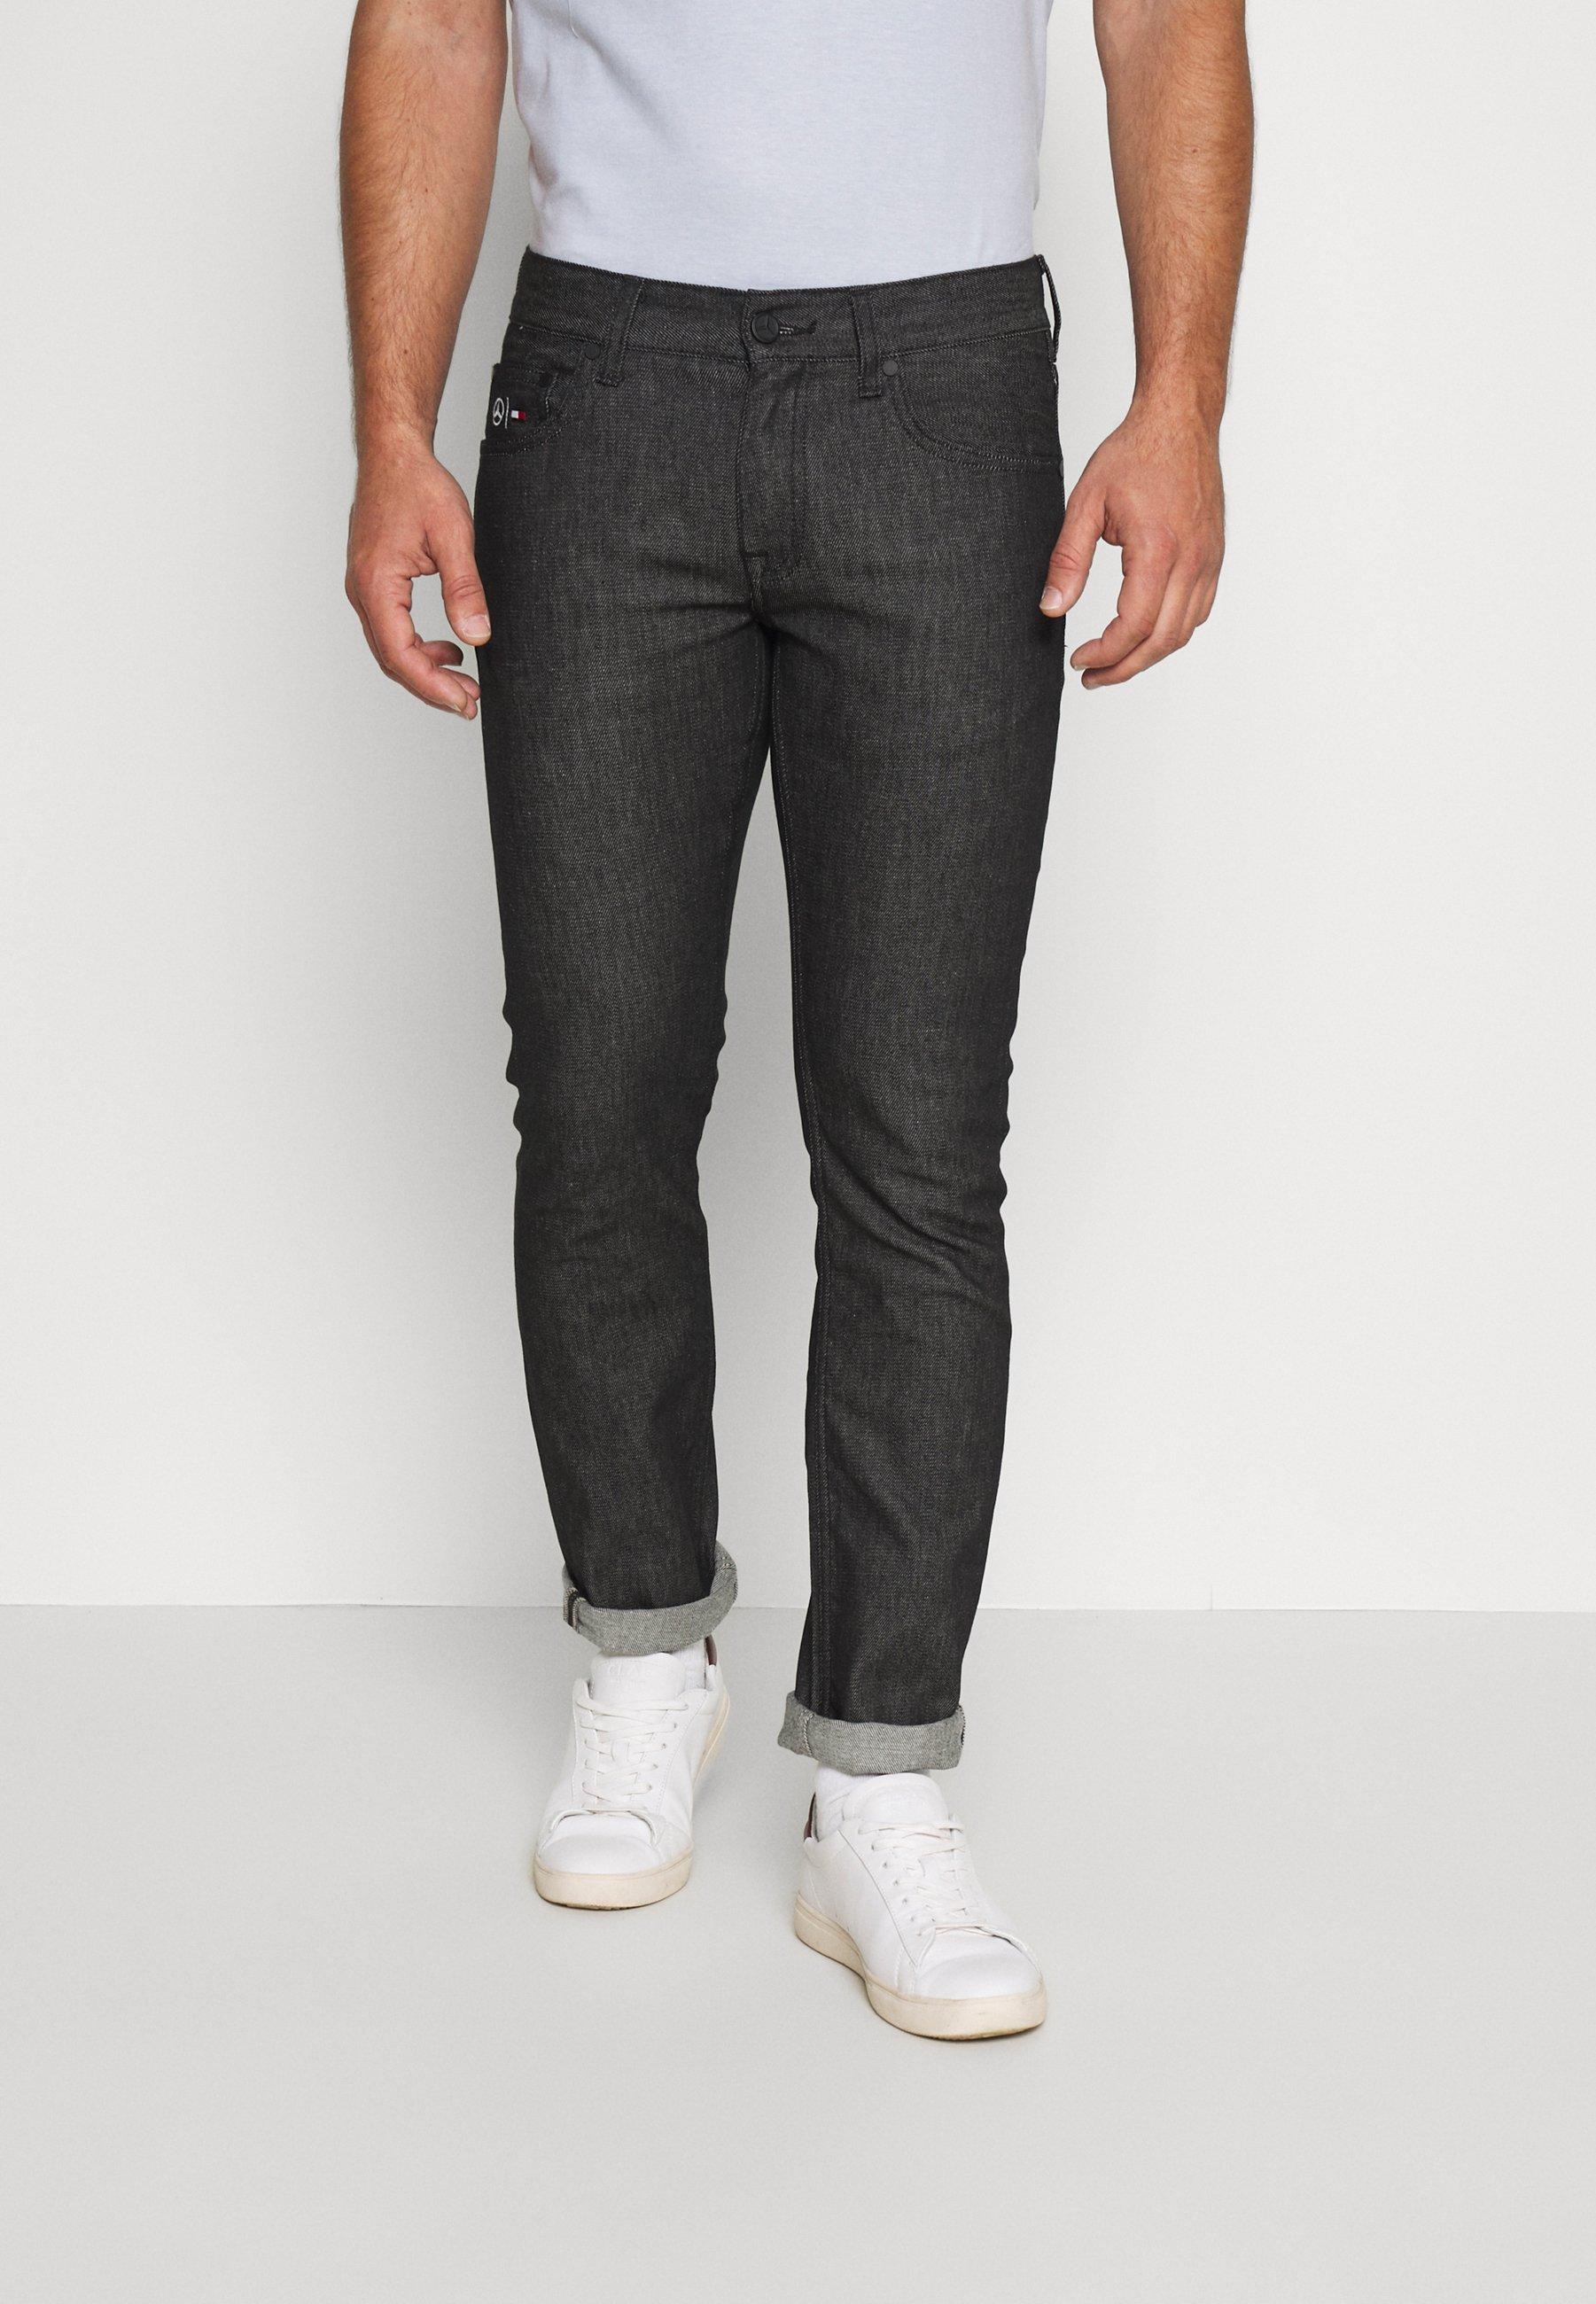 Men TOMMY X MERCEDES-BENZ - Slim fit jeans